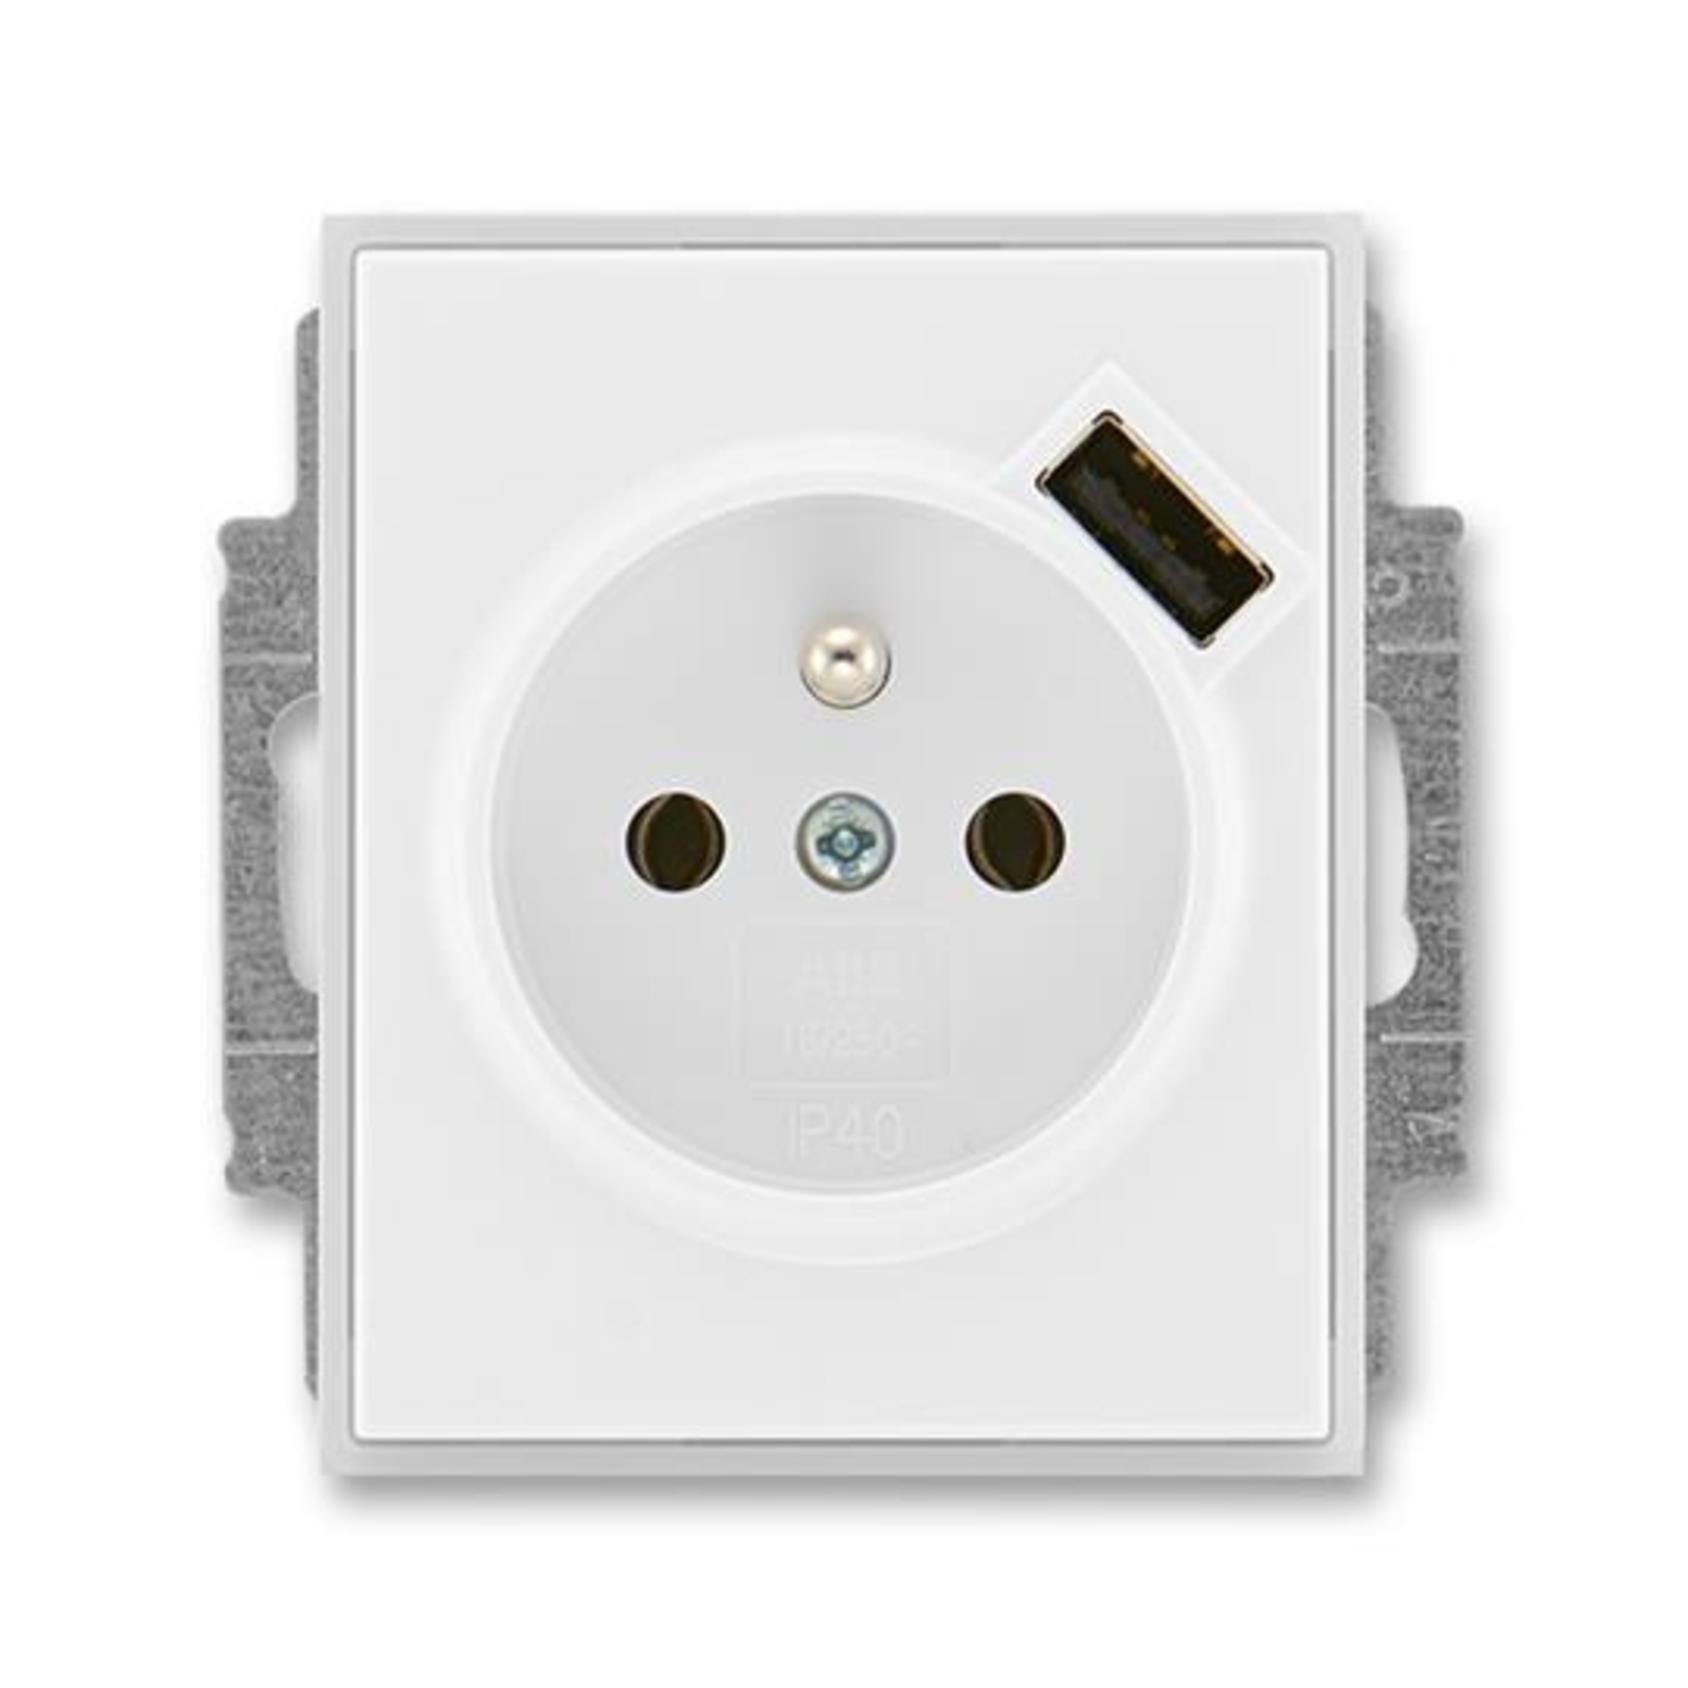 ABB 5569E-A02357 01 Element Zásuvka 1násobná s kolíkem, s clonkami, s USB nabíjením